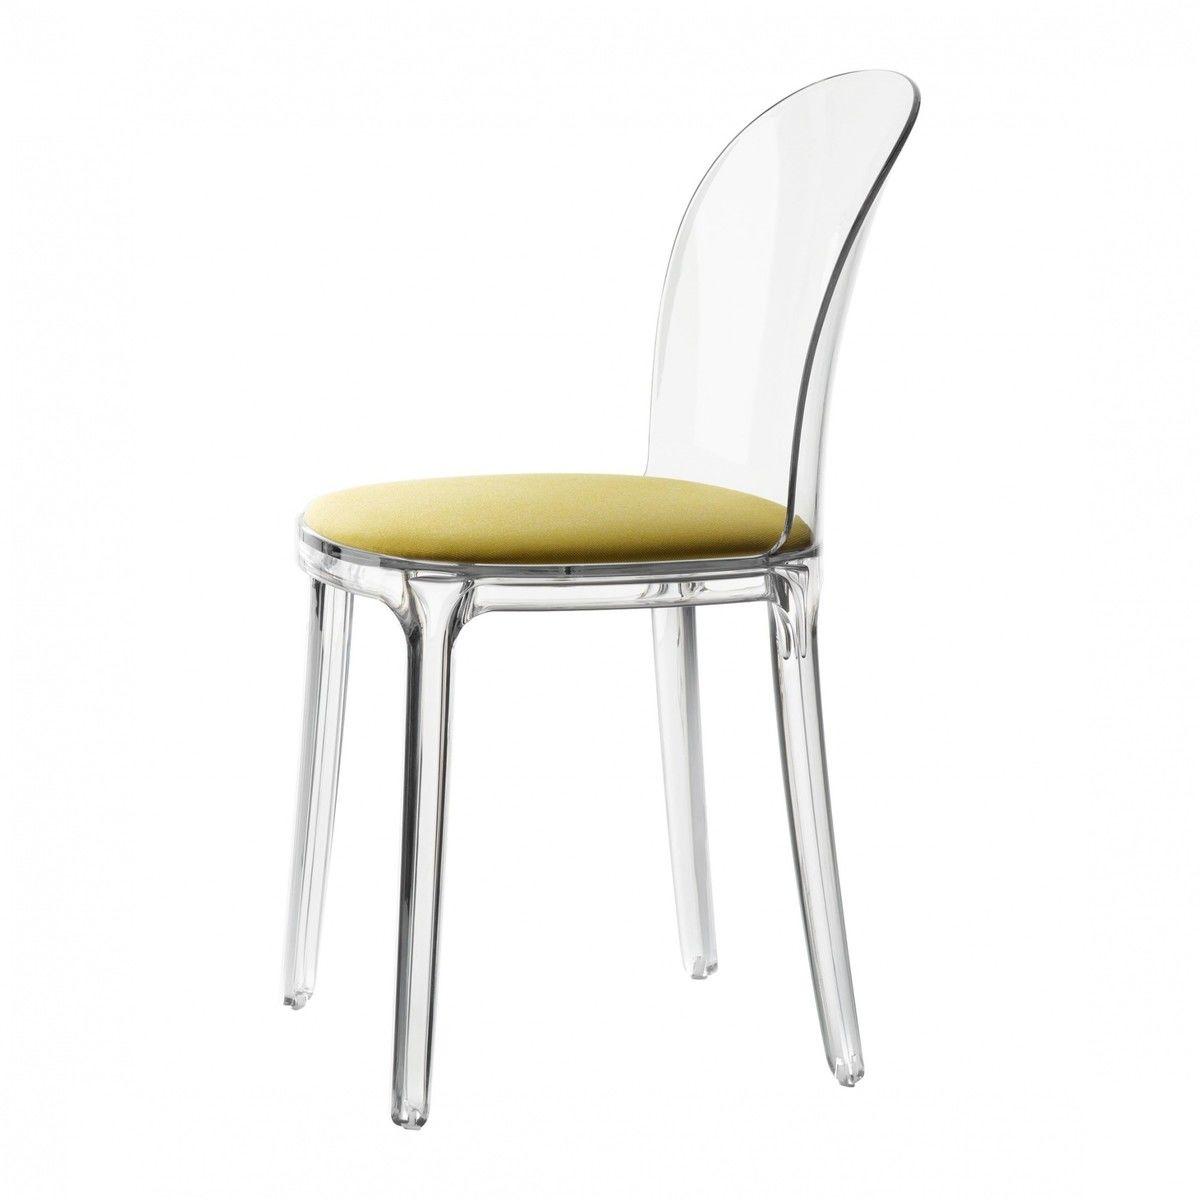 Vanity chair chaise transparente magis - Chaise transparente couleur ...